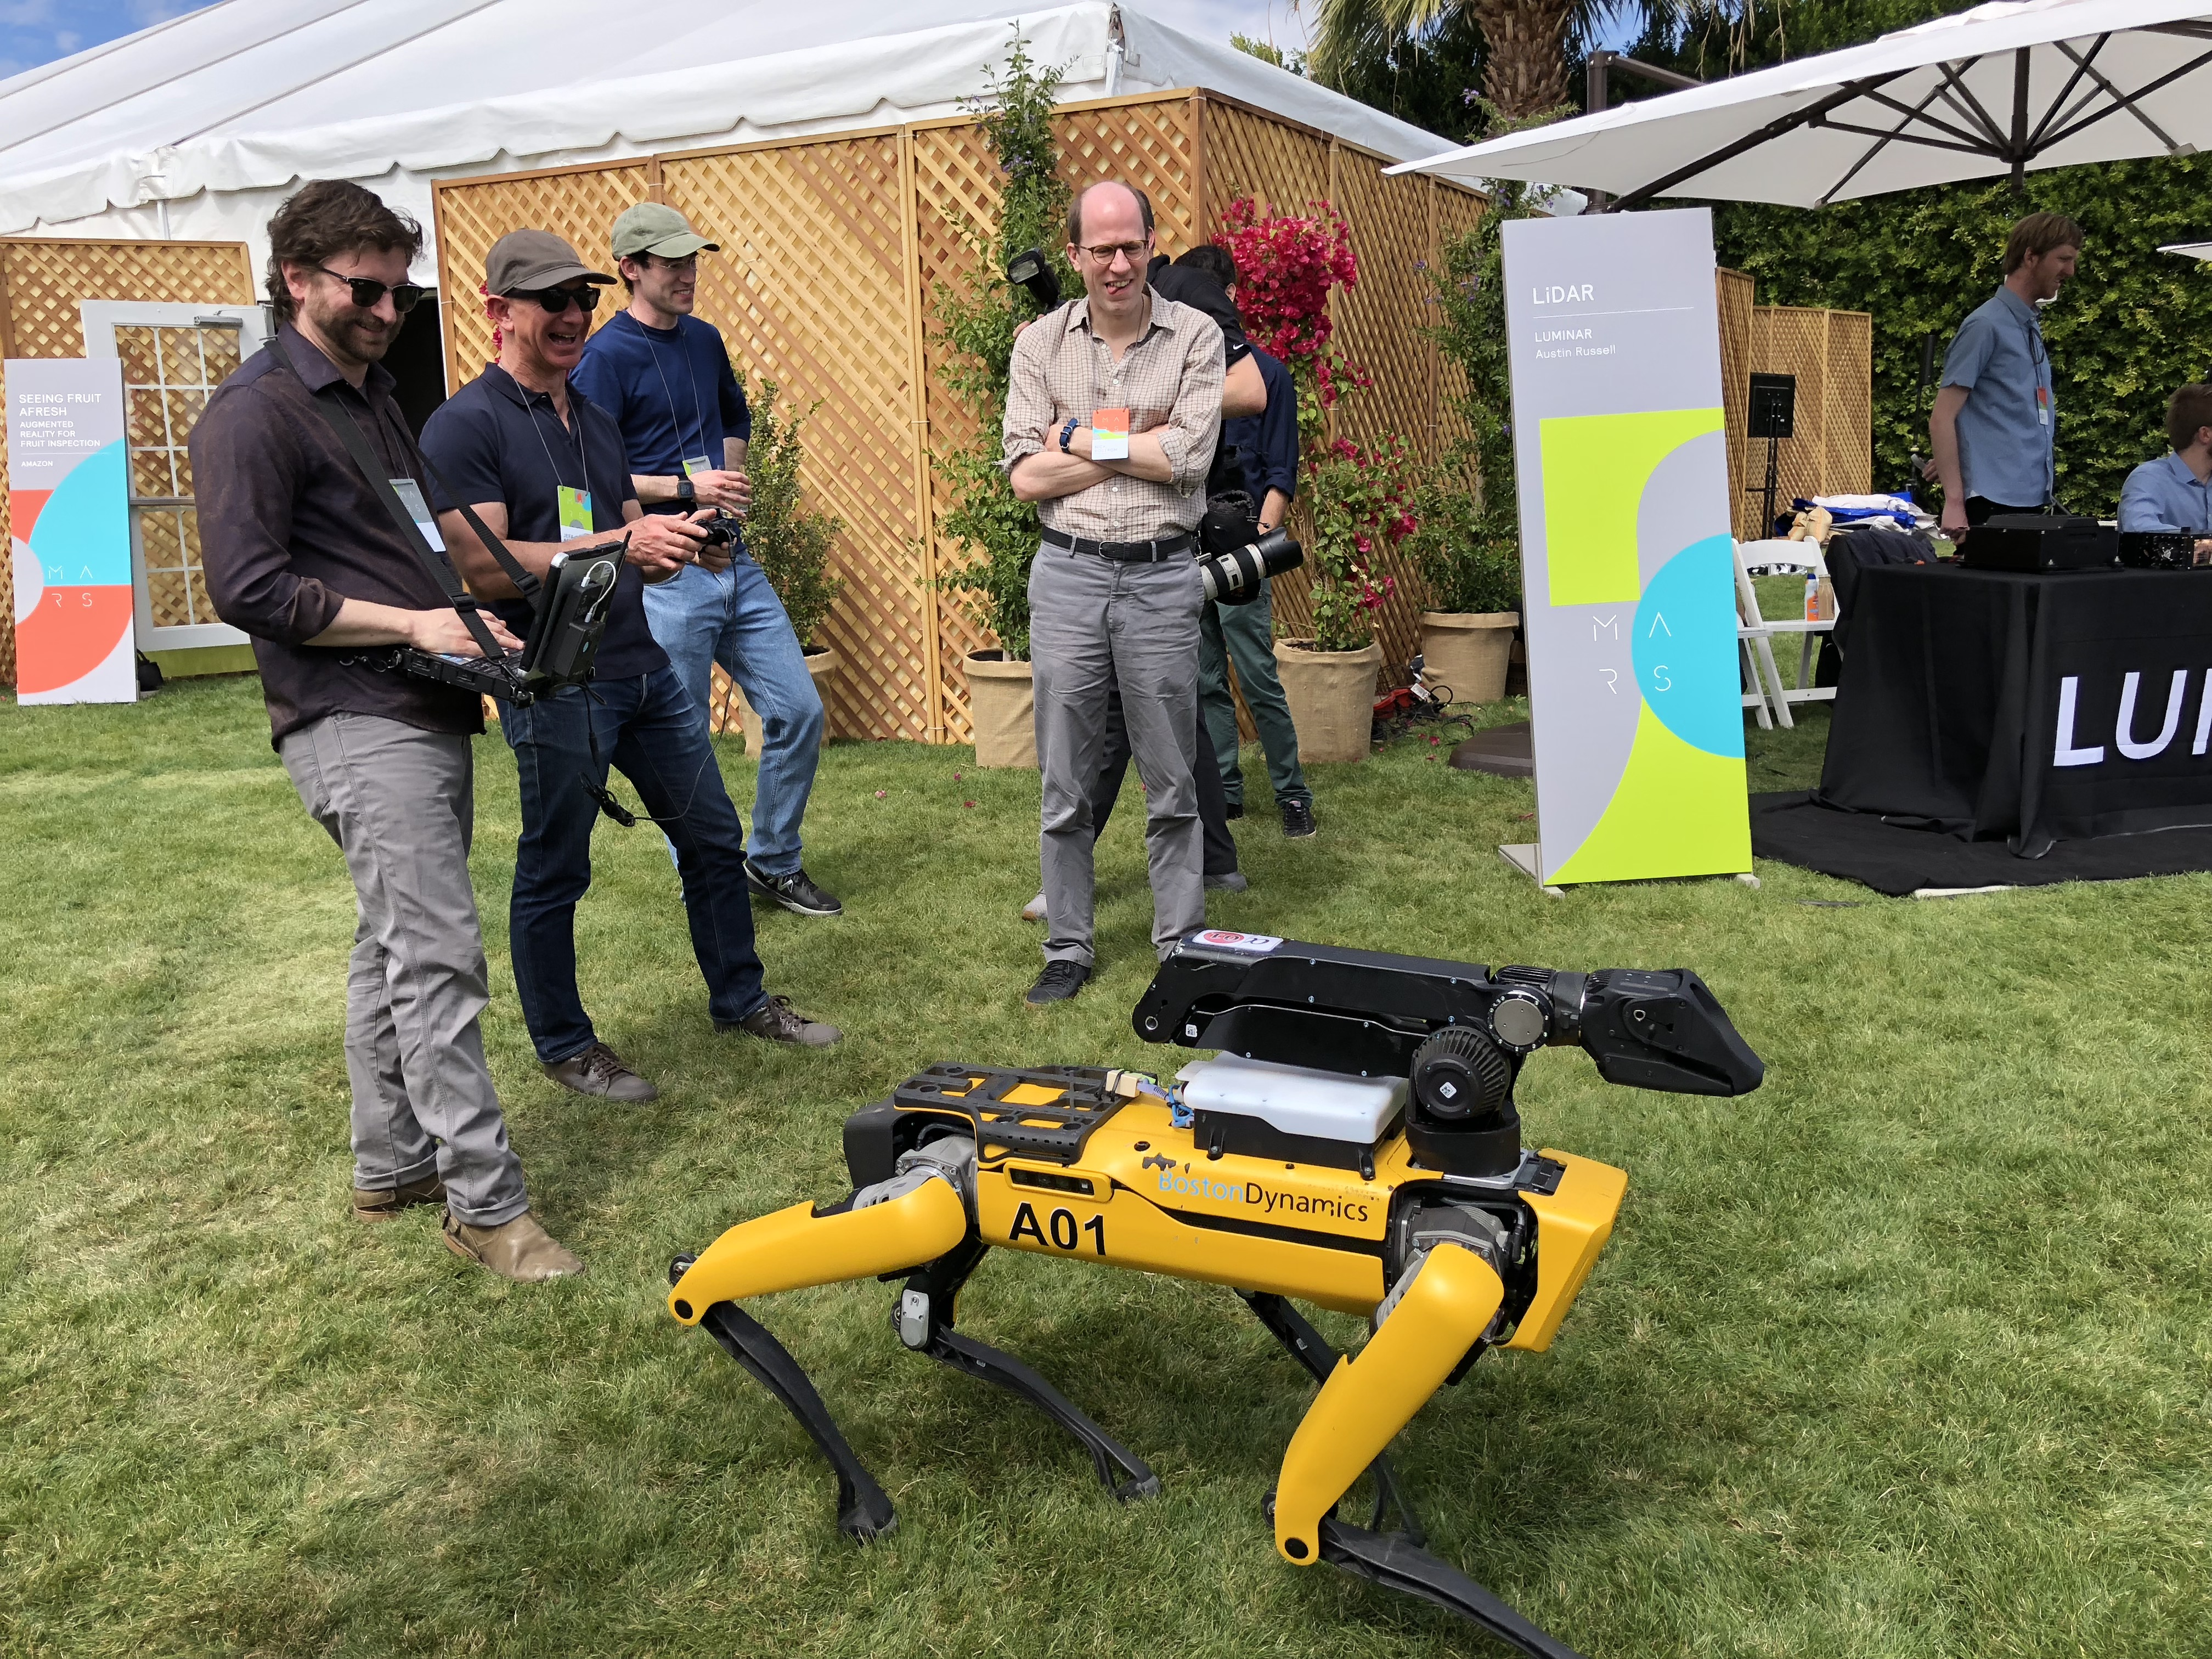 Jeff Bezos, center, pilots the Boston Dynamics SpotMini.